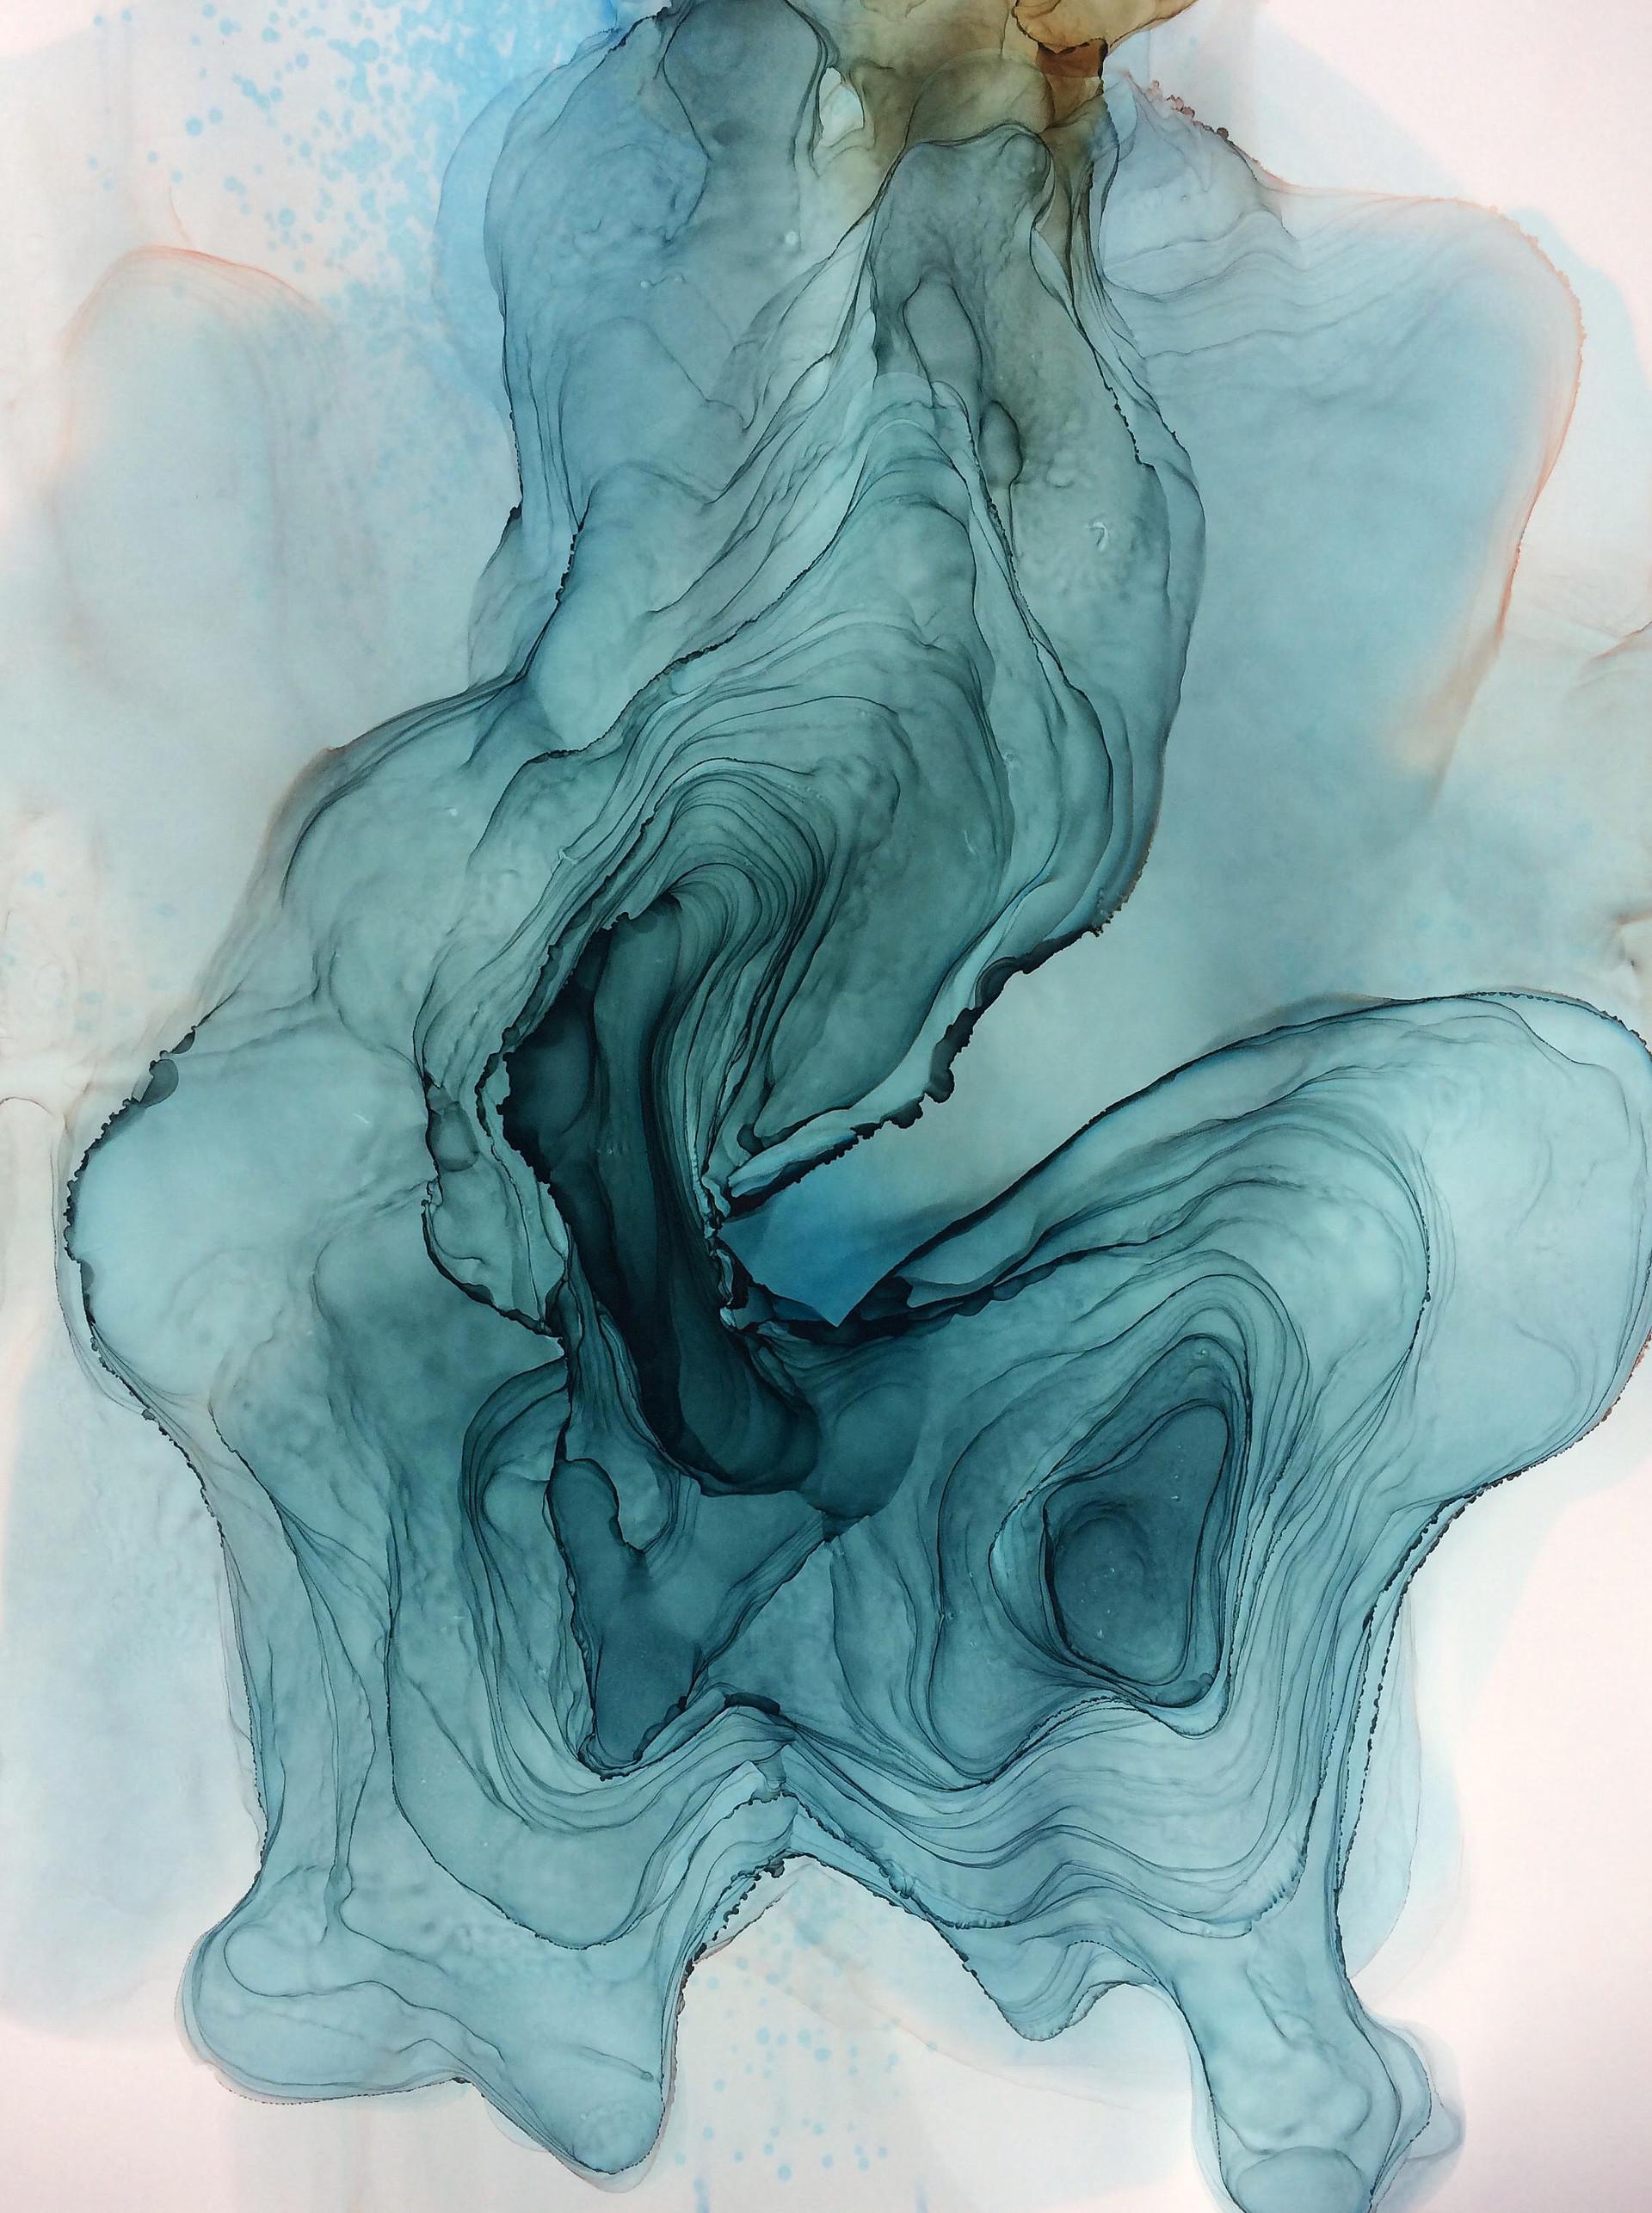 Aqueous 1 Alcohol Ink on Polypropylene Paper 2017